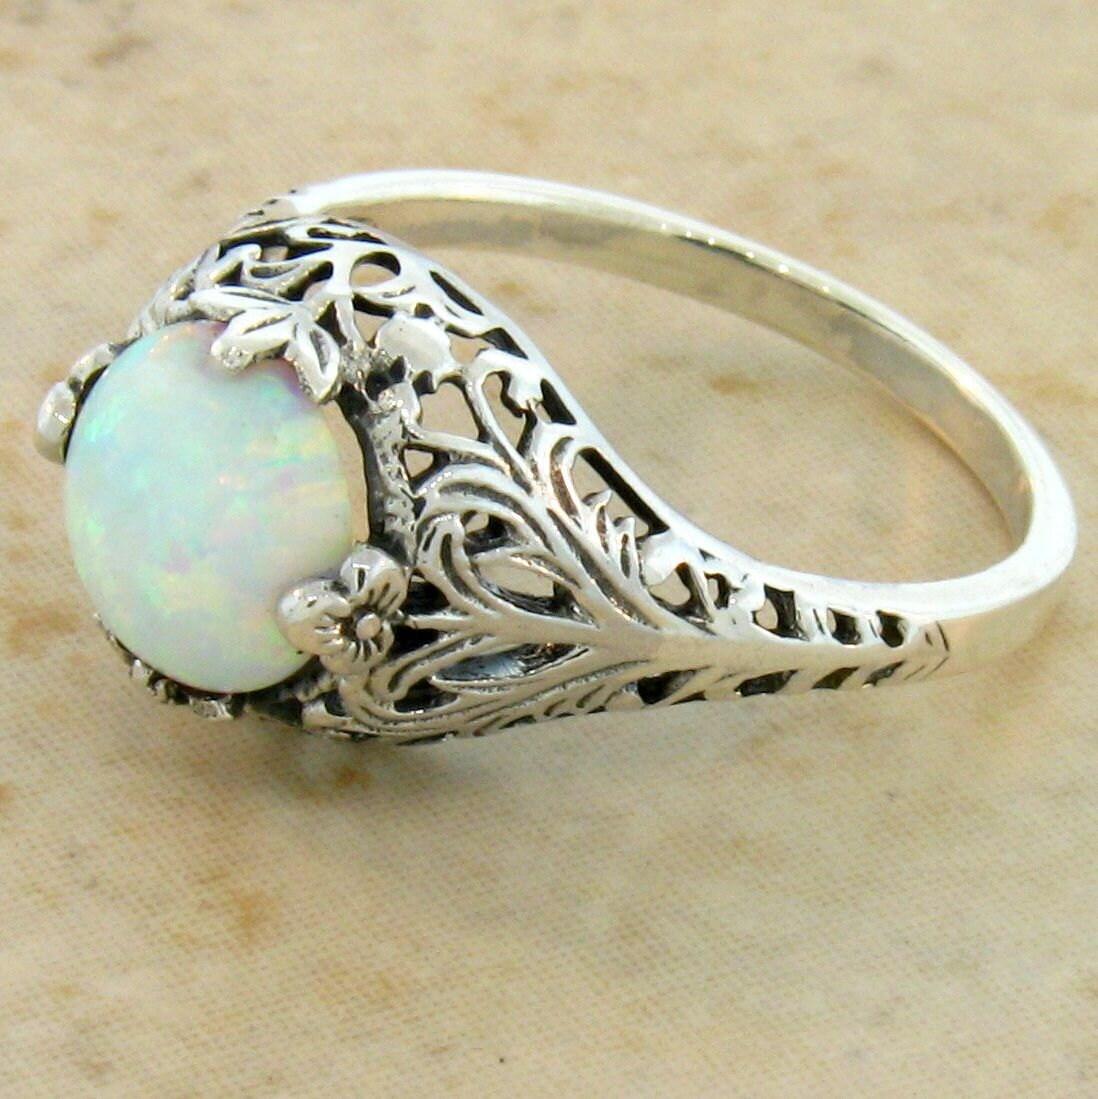 antique victorian style white opal filigree engagement ring. Black Bedroom Furniture Sets. Home Design Ideas